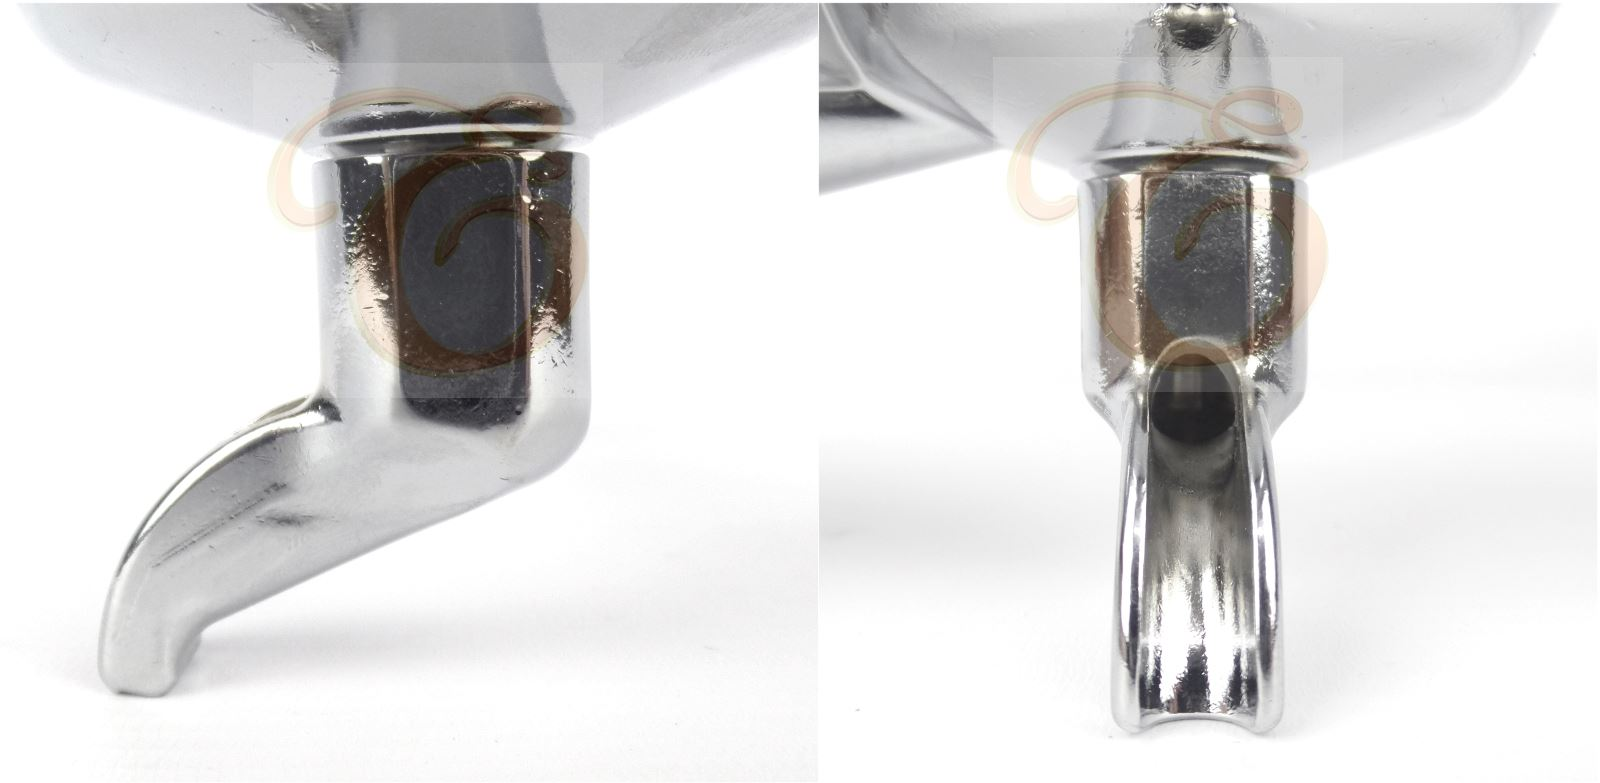 DRM 160 MM cheminée balais rohrbürste réparation zugwischer 2 M maintenance